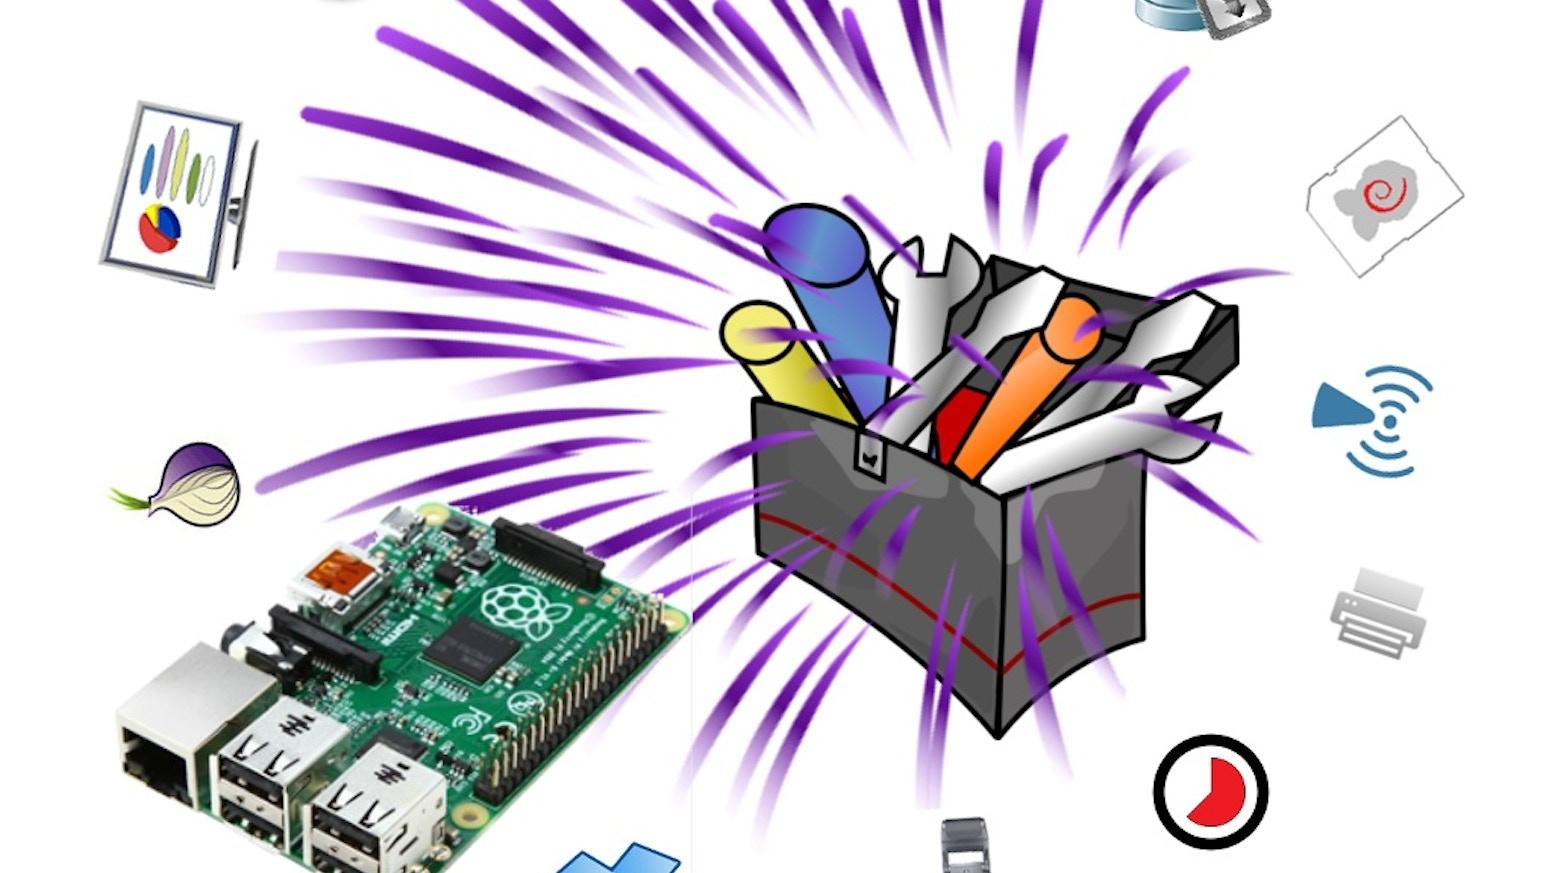 RasPiToolBox - Raspberry Pi Project Tool Box by RaspiShop